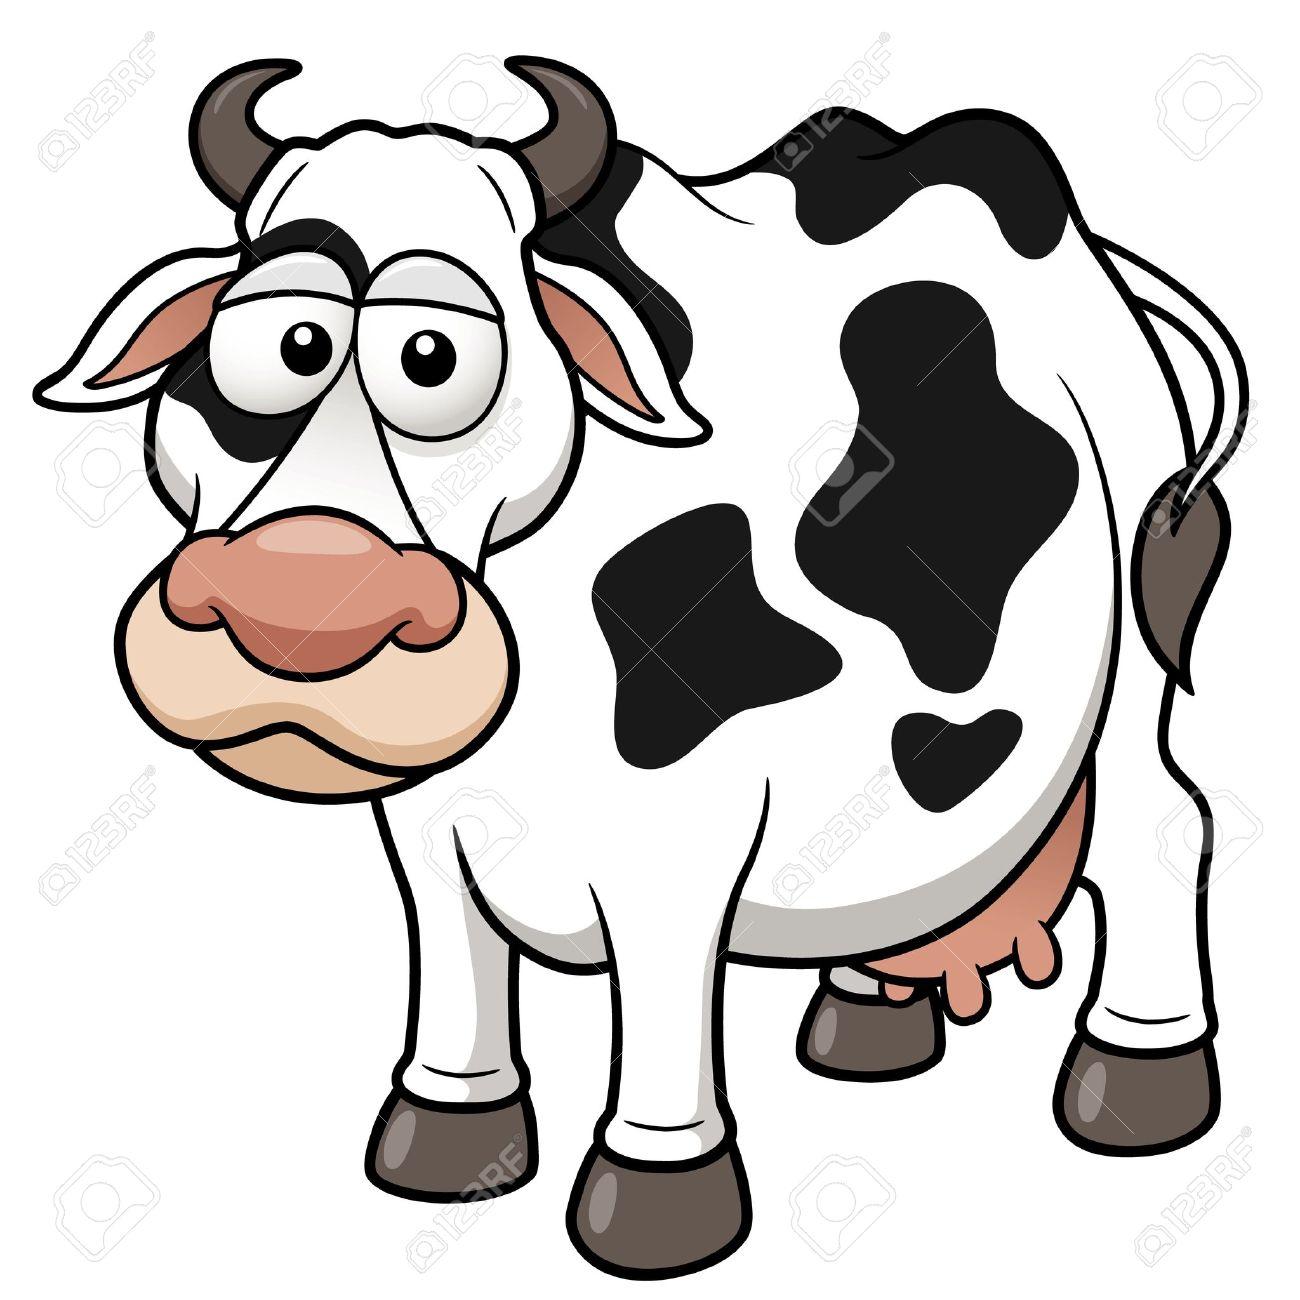 1300x1300 Vector Illustration Of Cow Cartoon Royalty Free Cliparts, Vectors